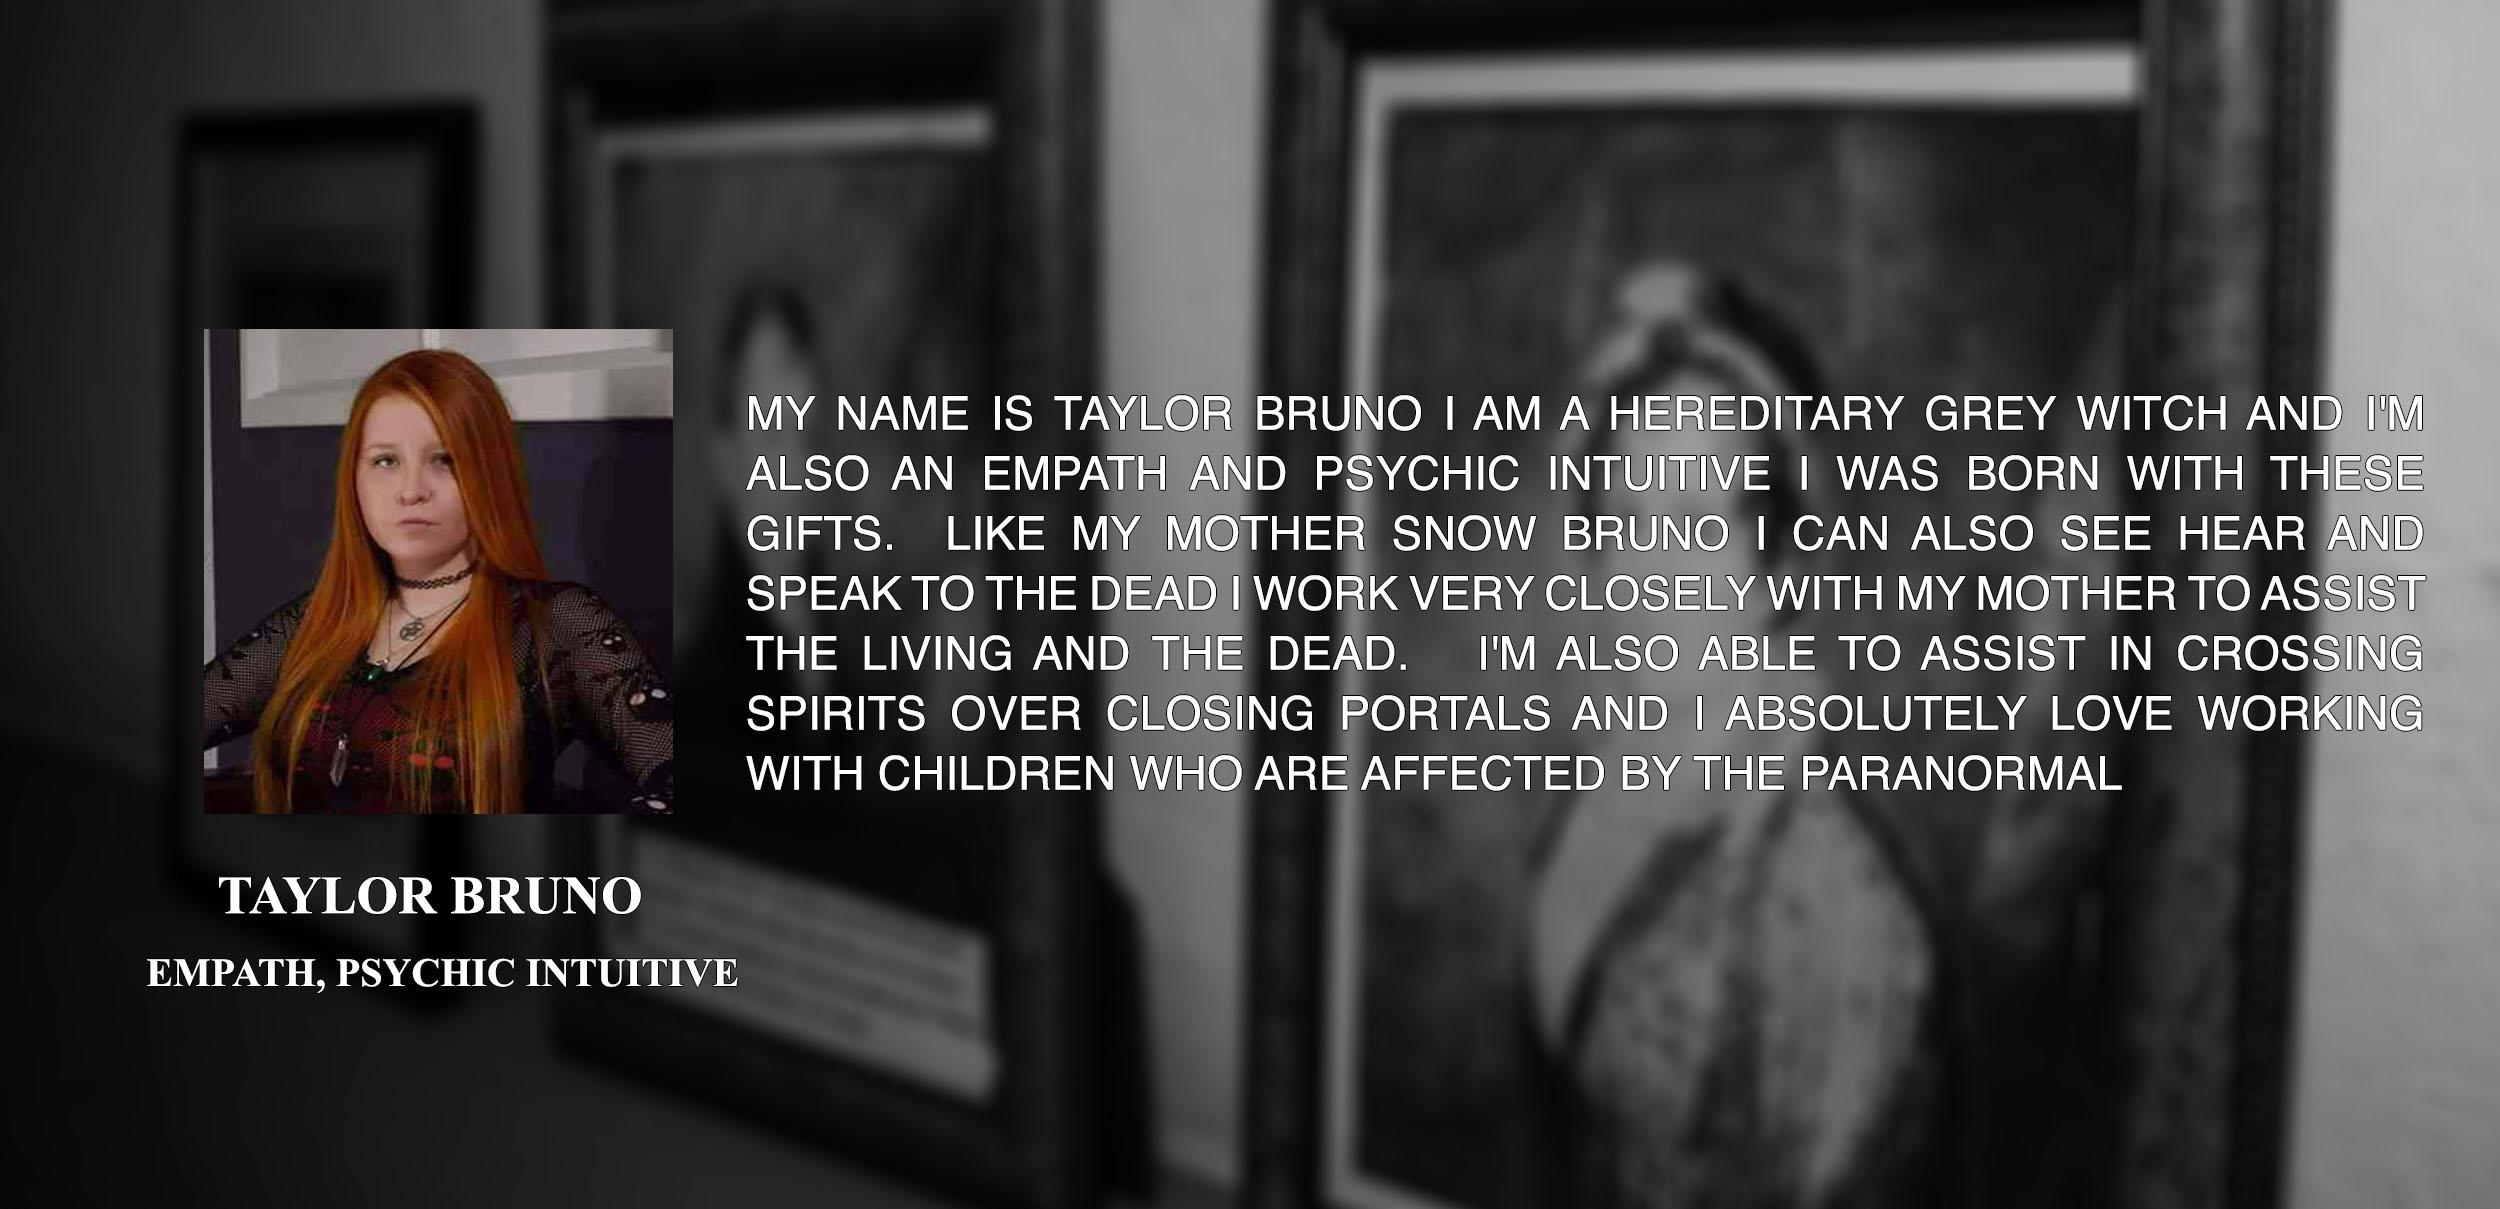 Taylor Bruno.jpg